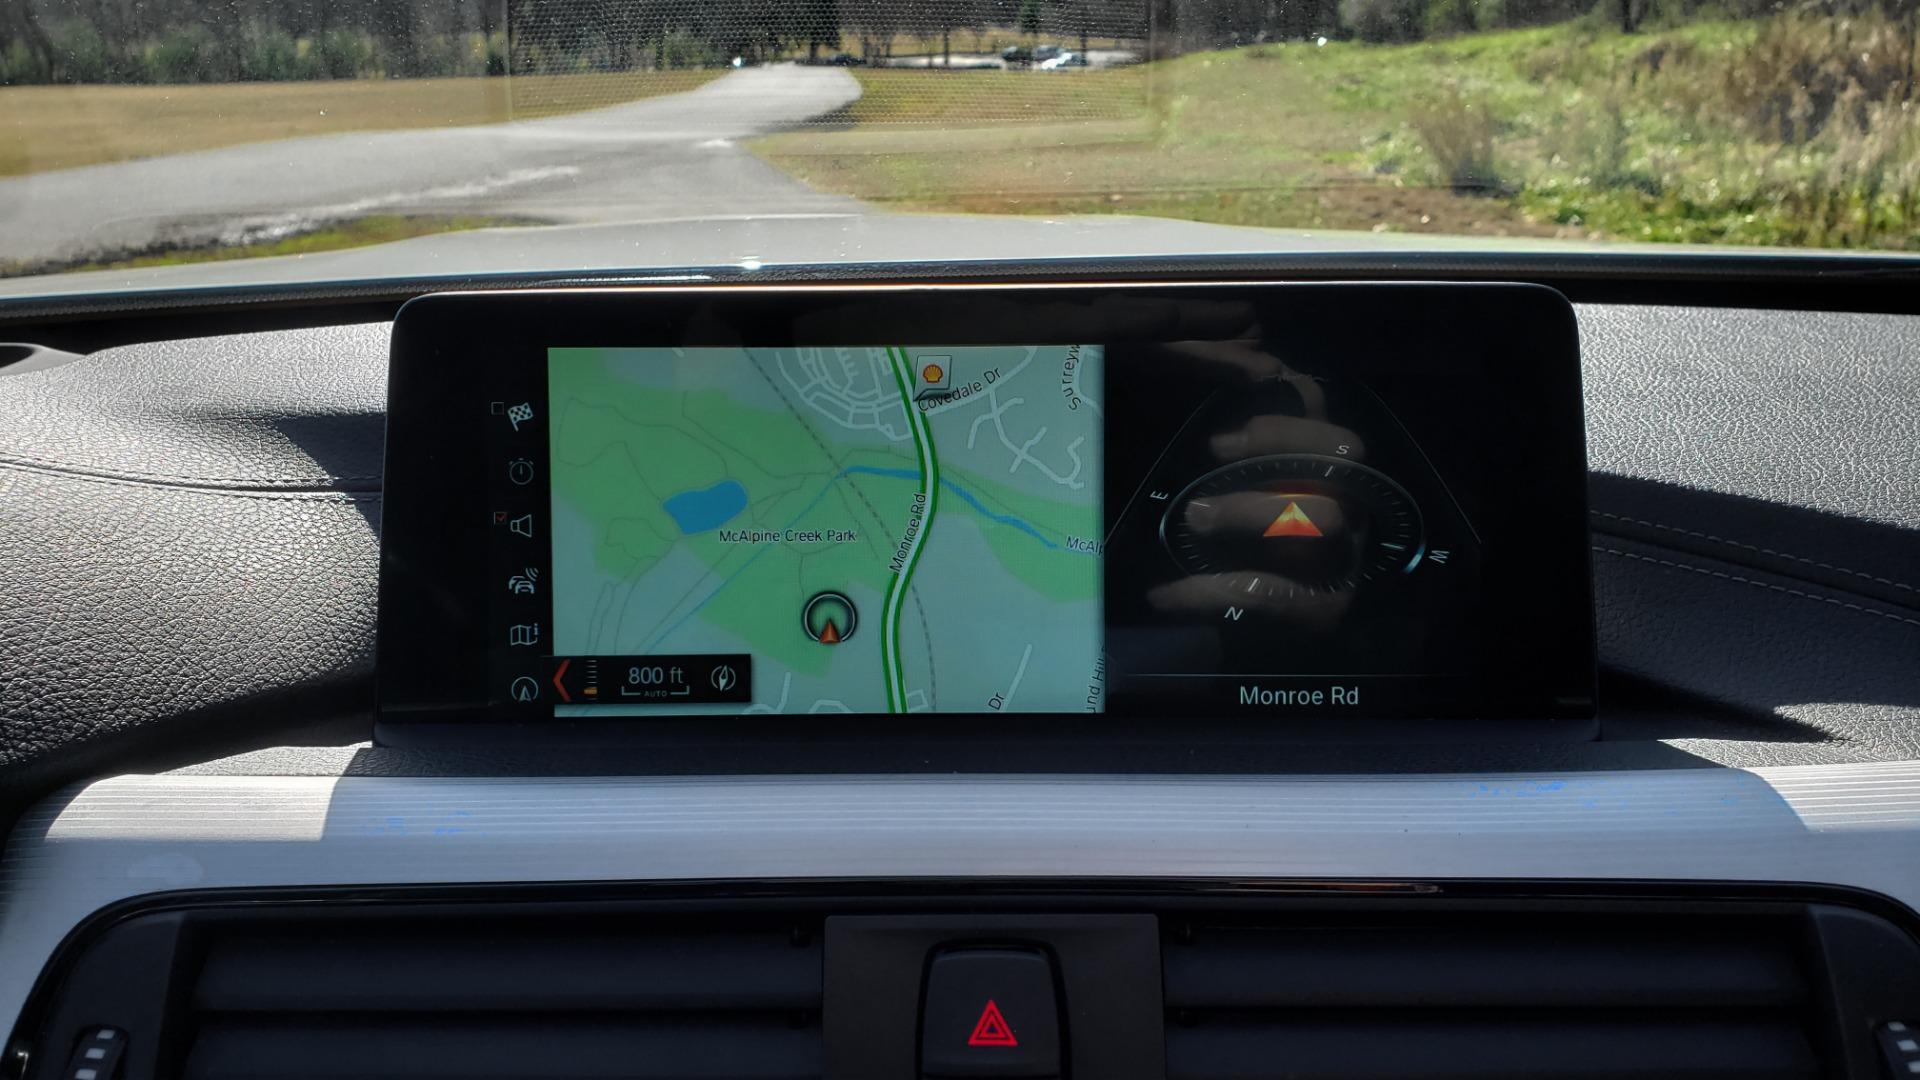 Used 2018 BMW M4 COMP PKG / EXEC / M-DRIVER / PARK CNTRL / ACTIVE BLIND SPOT for sale Sold at Formula Imports in Charlotte NC 28227 48